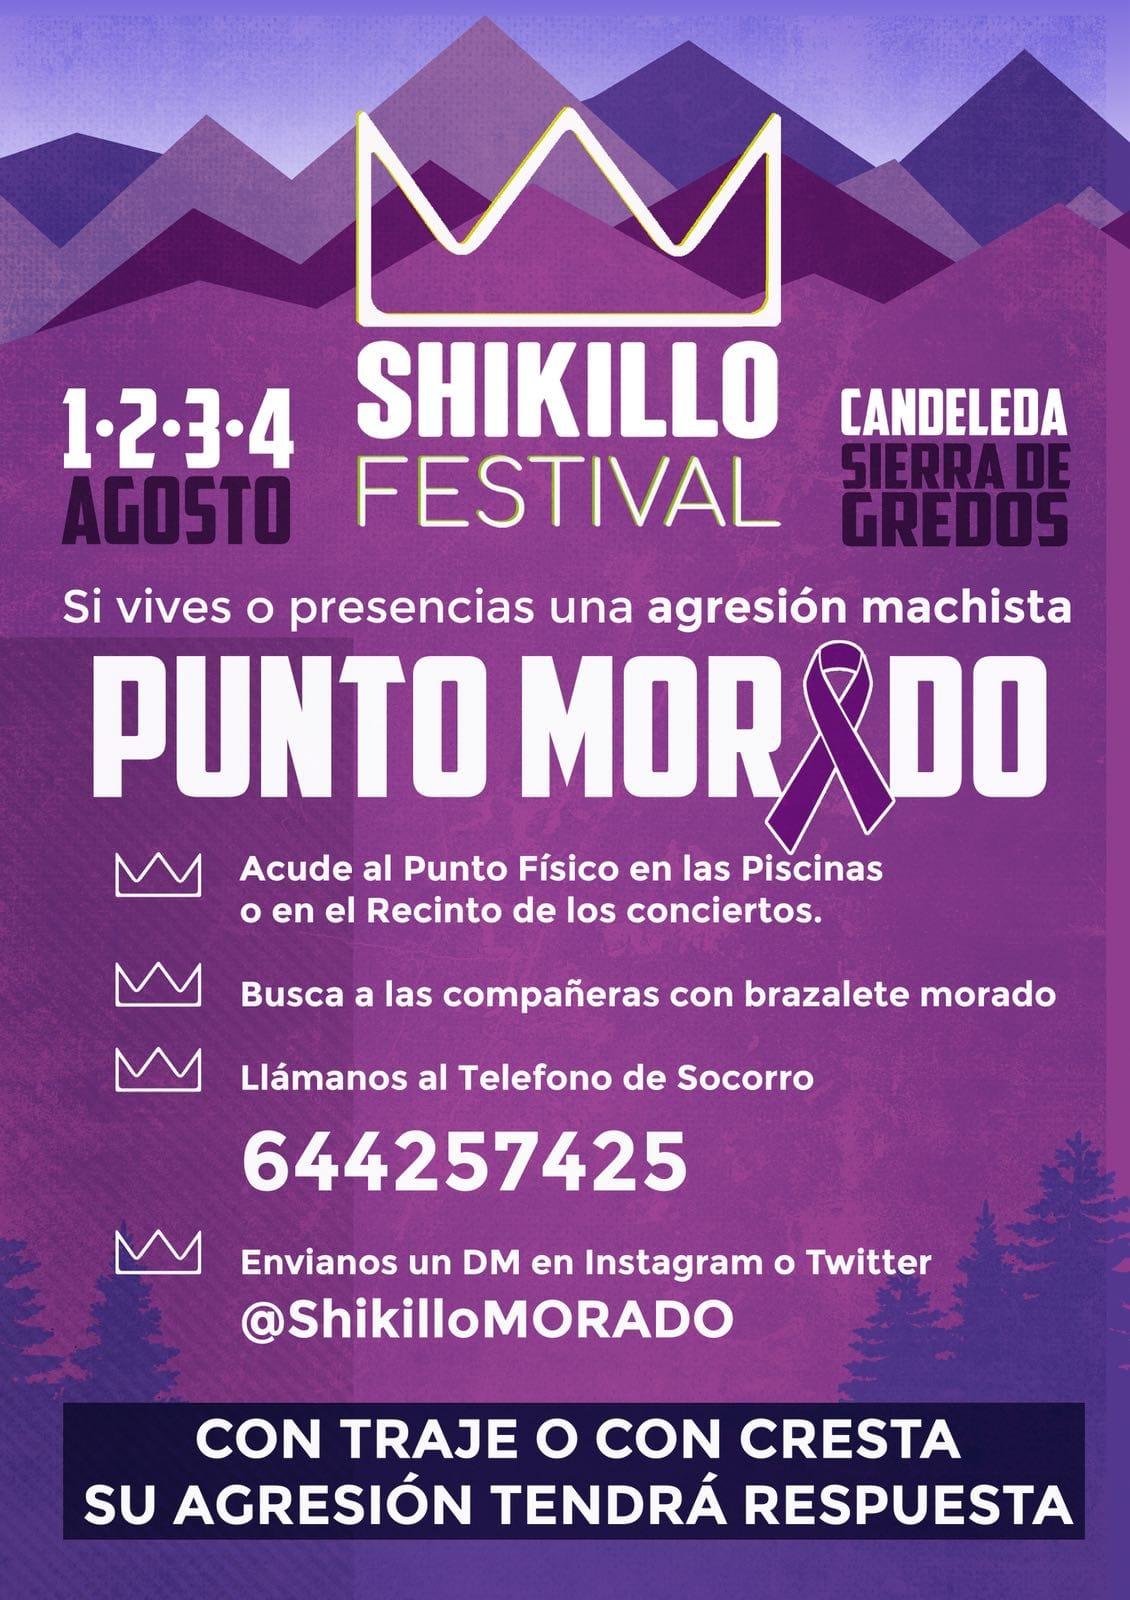 Punto Morado - Shikillo Festival - Candeleda - TiétarTeVe